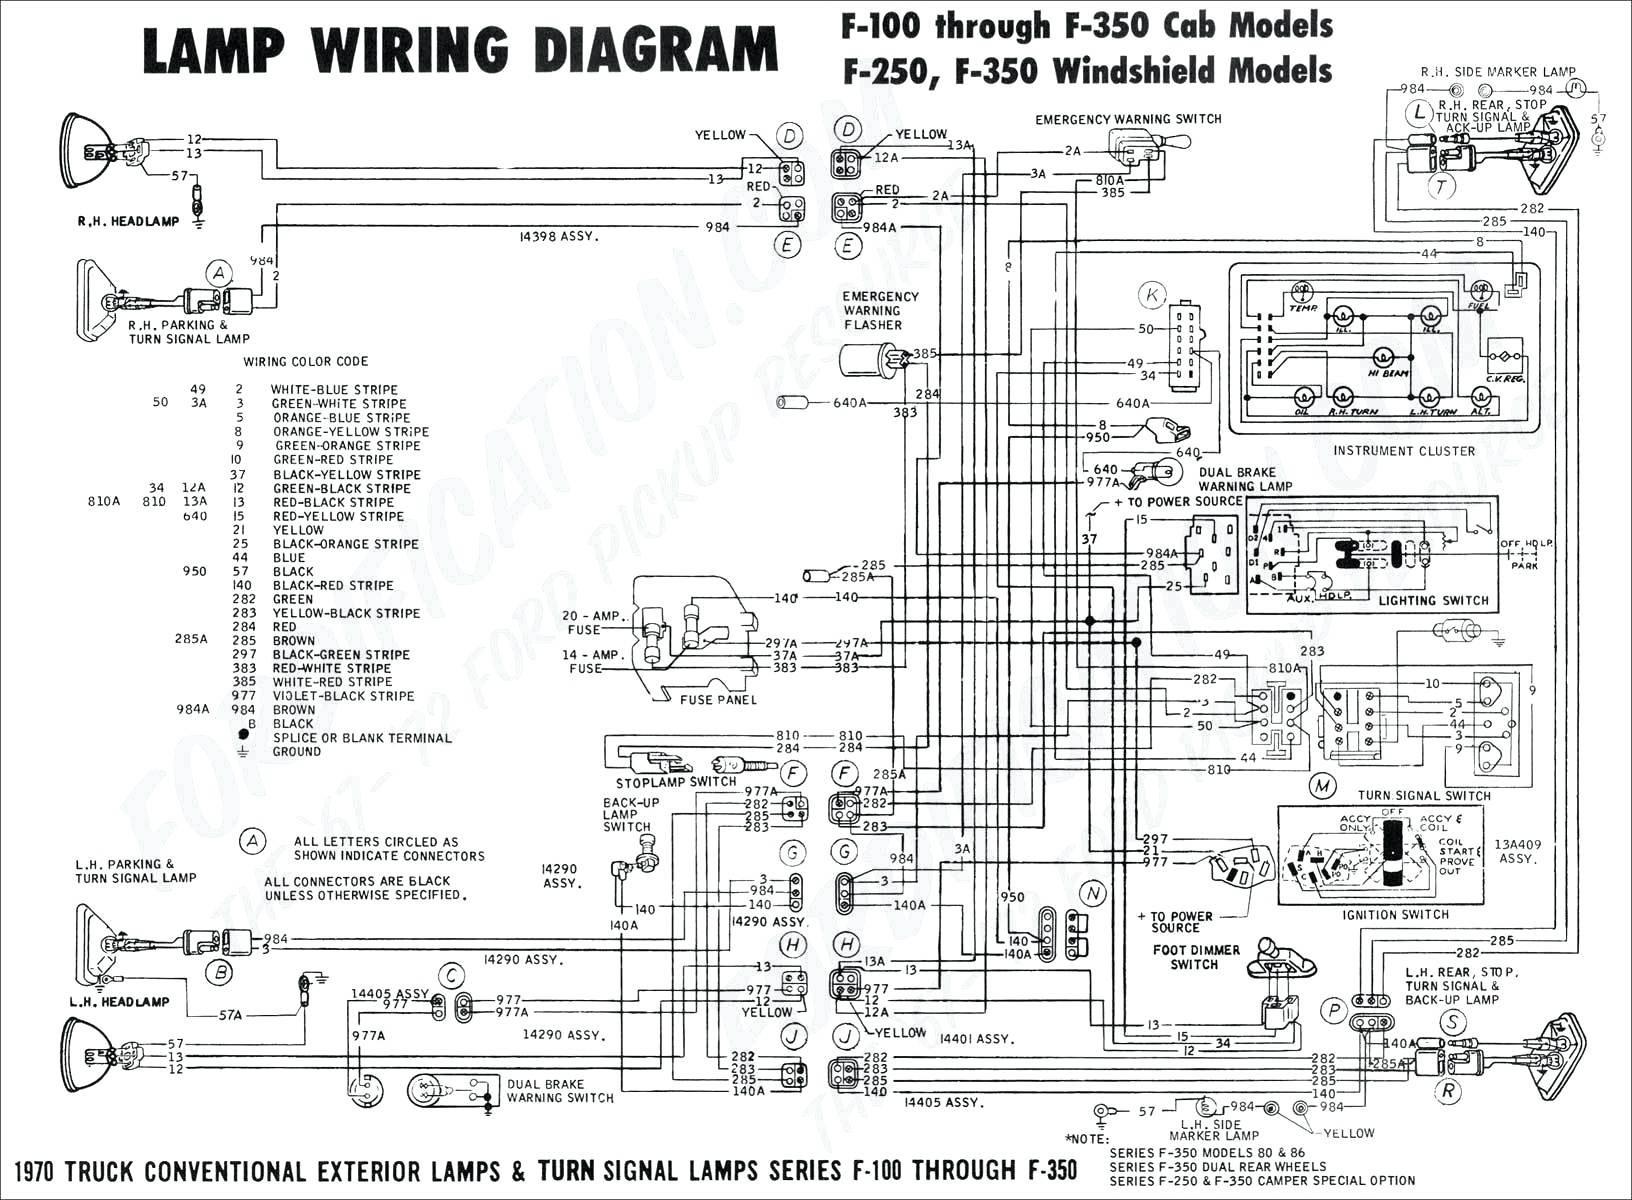 2000 Lincoln town Car Wiring Diagram 2000 Bronco Wiring Diagram Another Blog About Wiring Diagram • Of 2000 Lincoln town Car Wiring Diagram